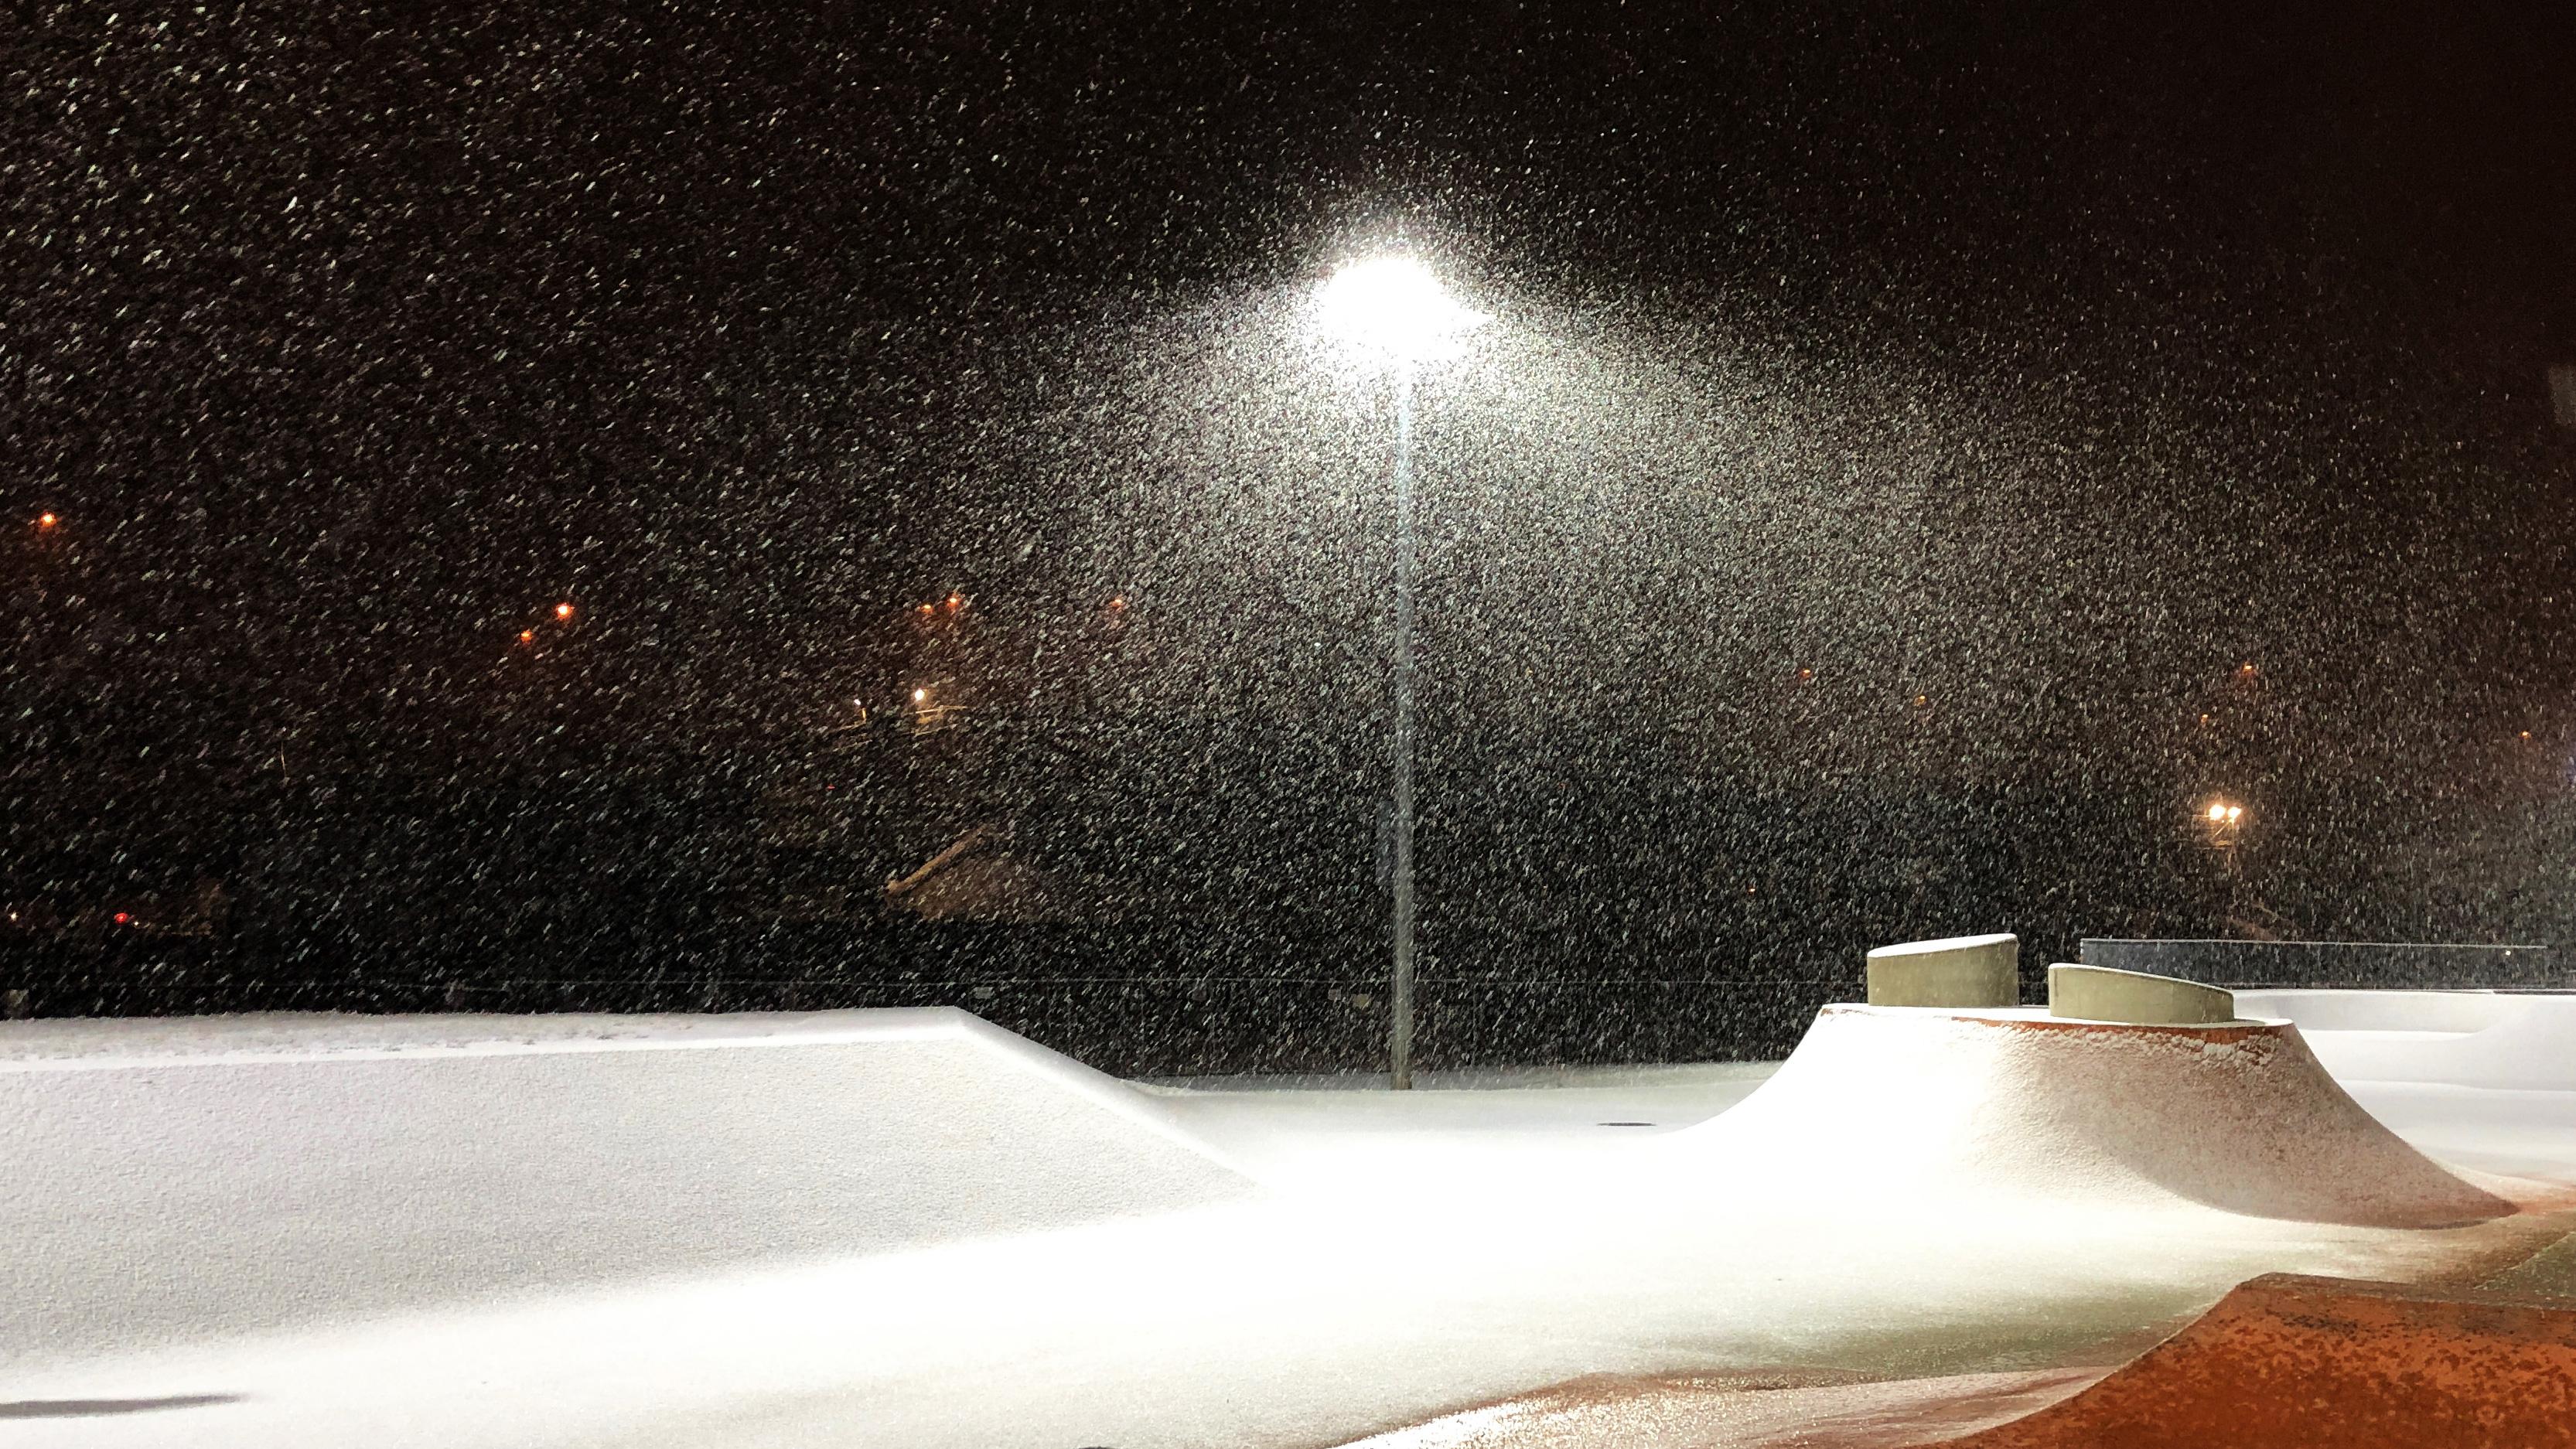 Photo - Snowing Boston